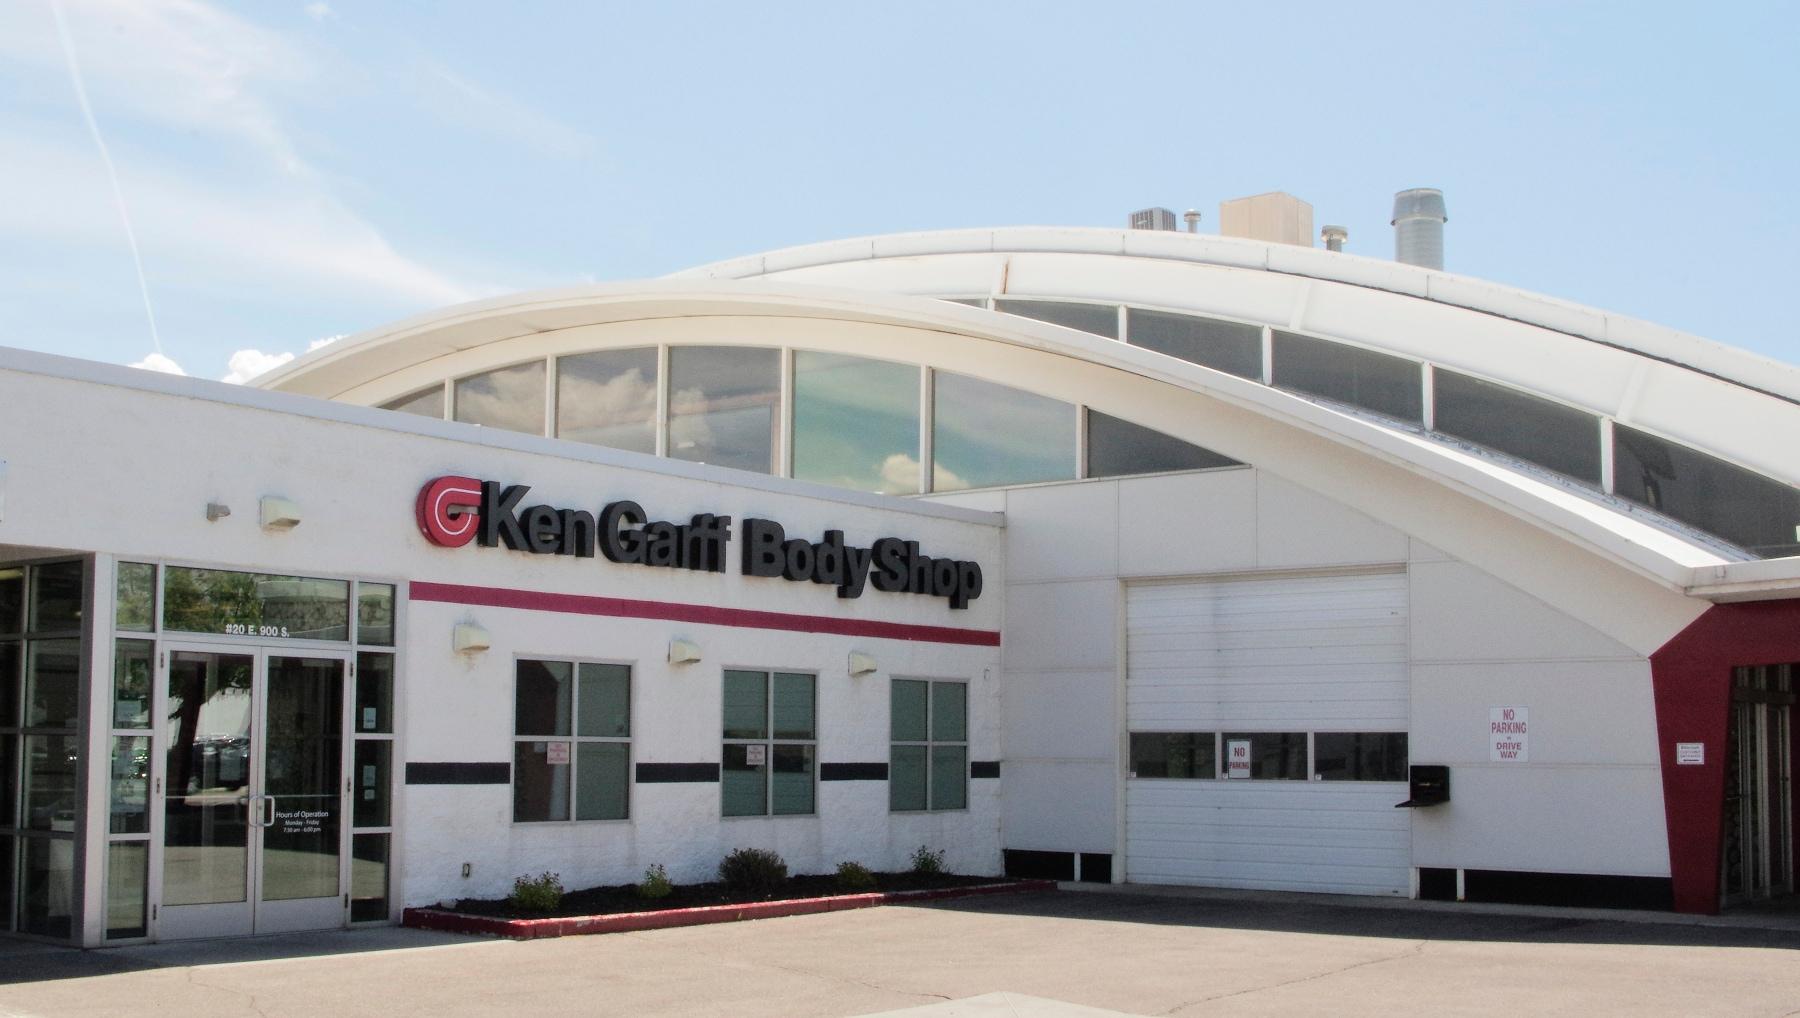 Auto Body Shop And Car Repair Salt Lake City Ken Garff